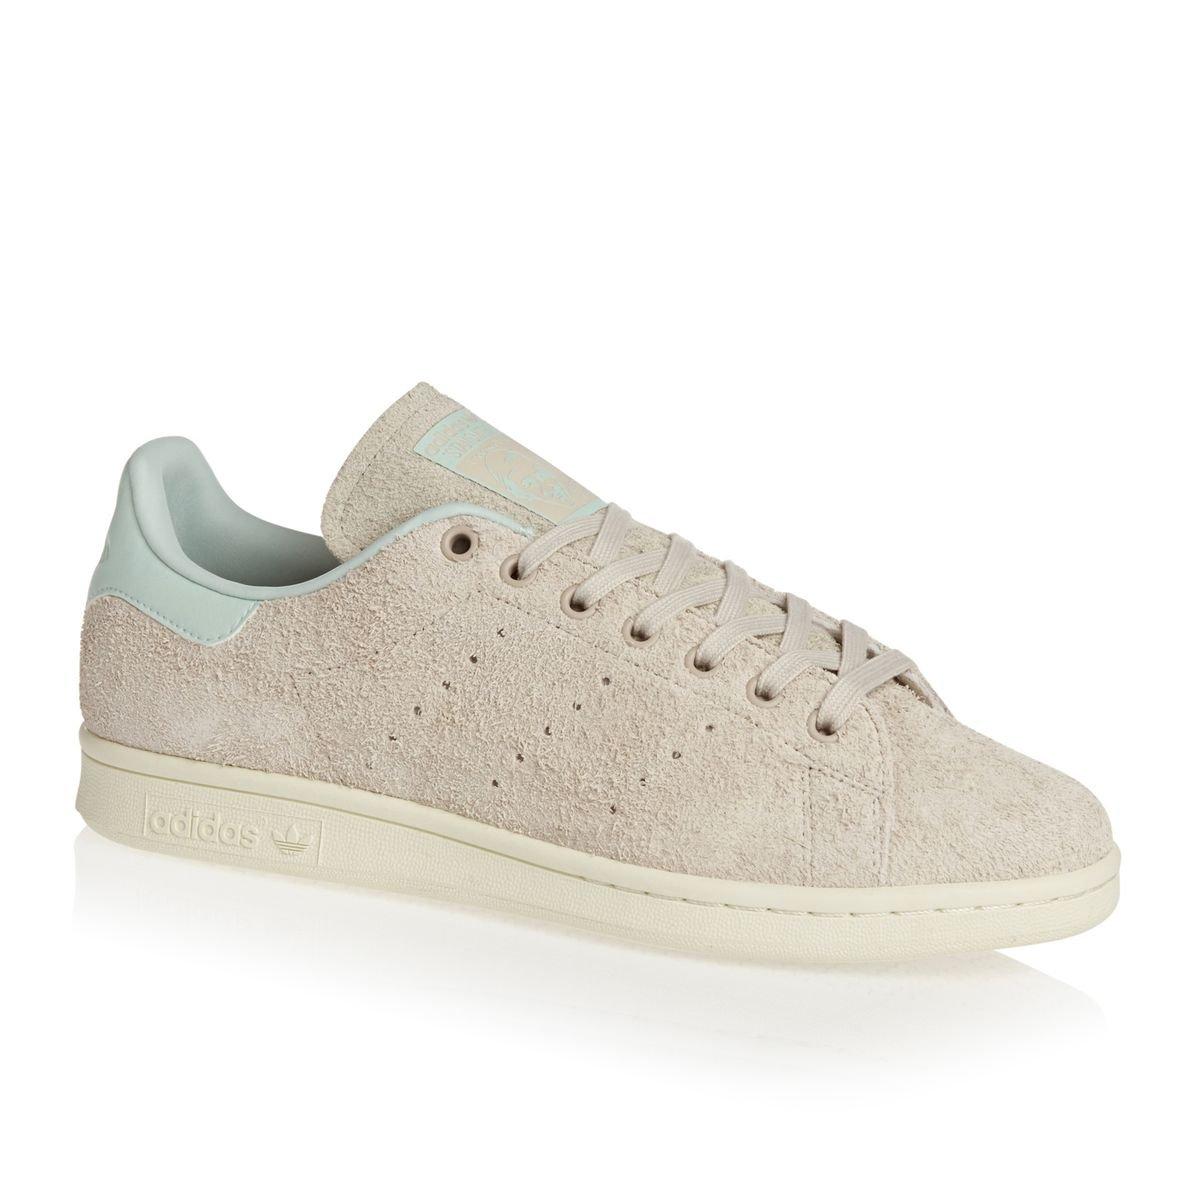 adidas Zapatillas Stan Smith W Beige/Verde/Blanco 36 EU|Beige